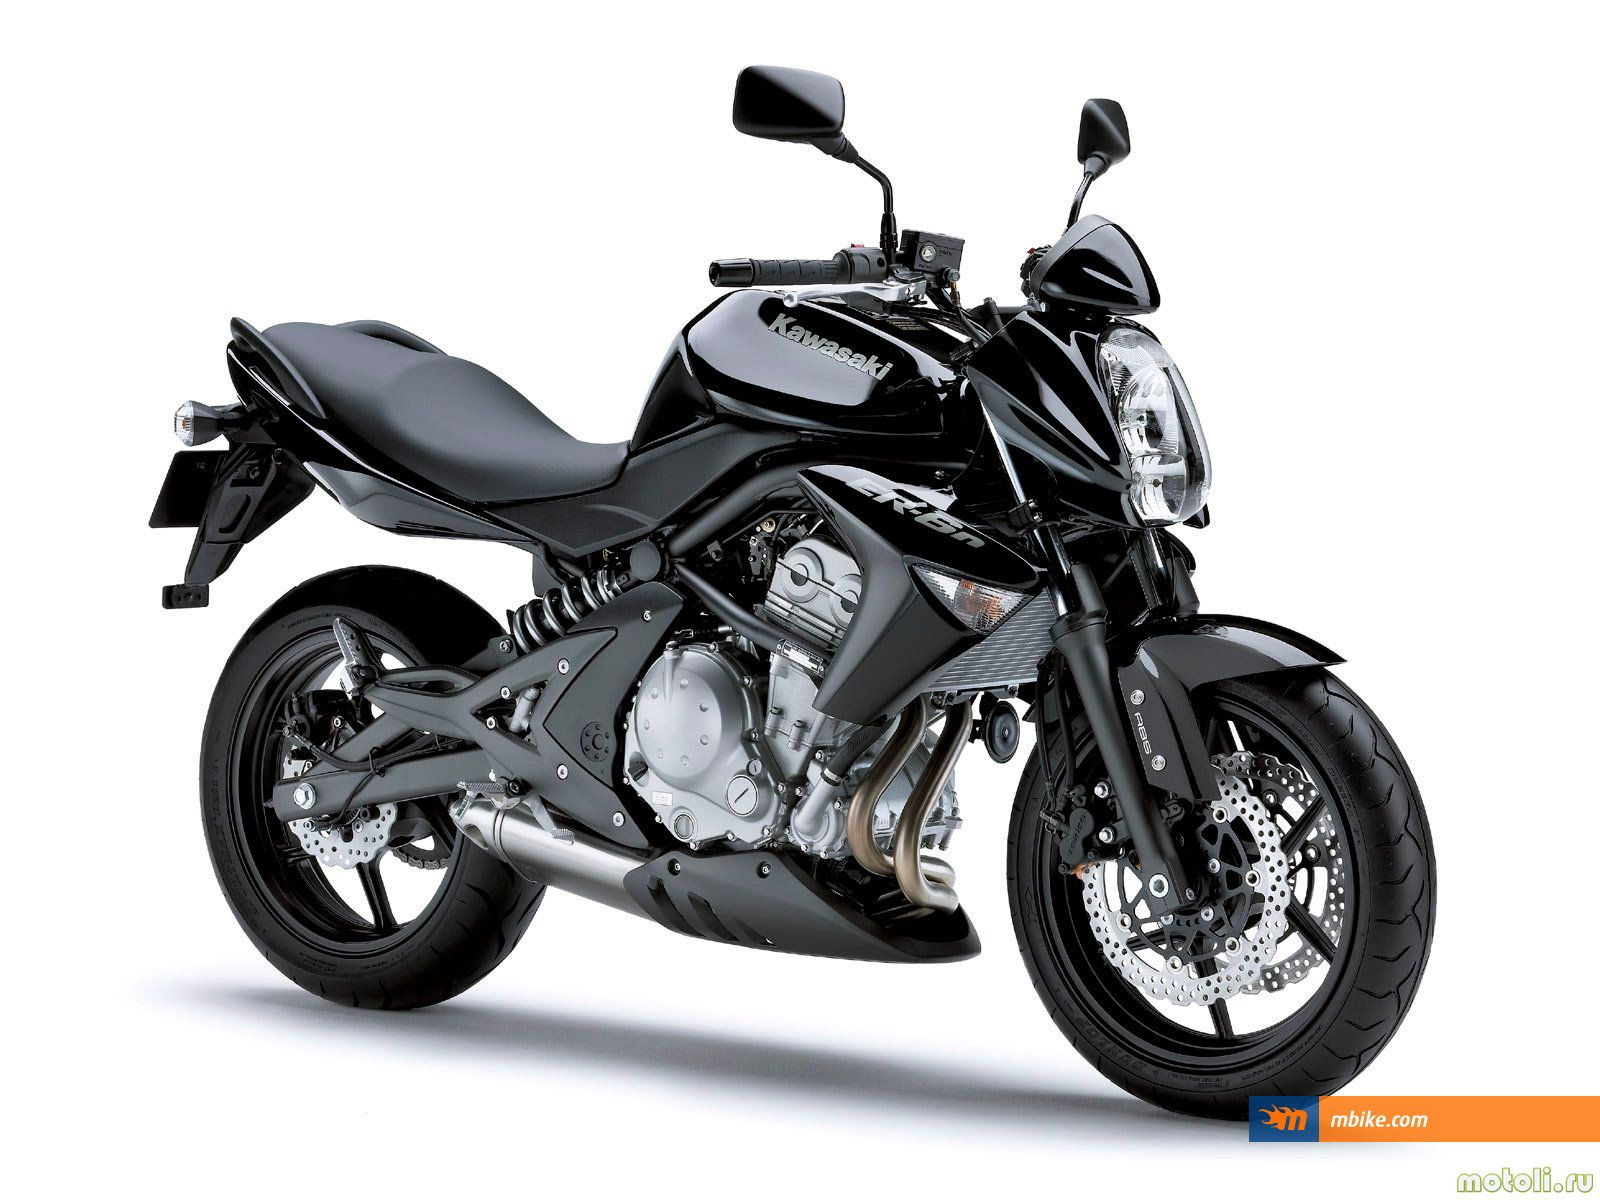 Информация по мотоциклу kawasaki er-6 (er-6n, er-6f, ninja 650r)